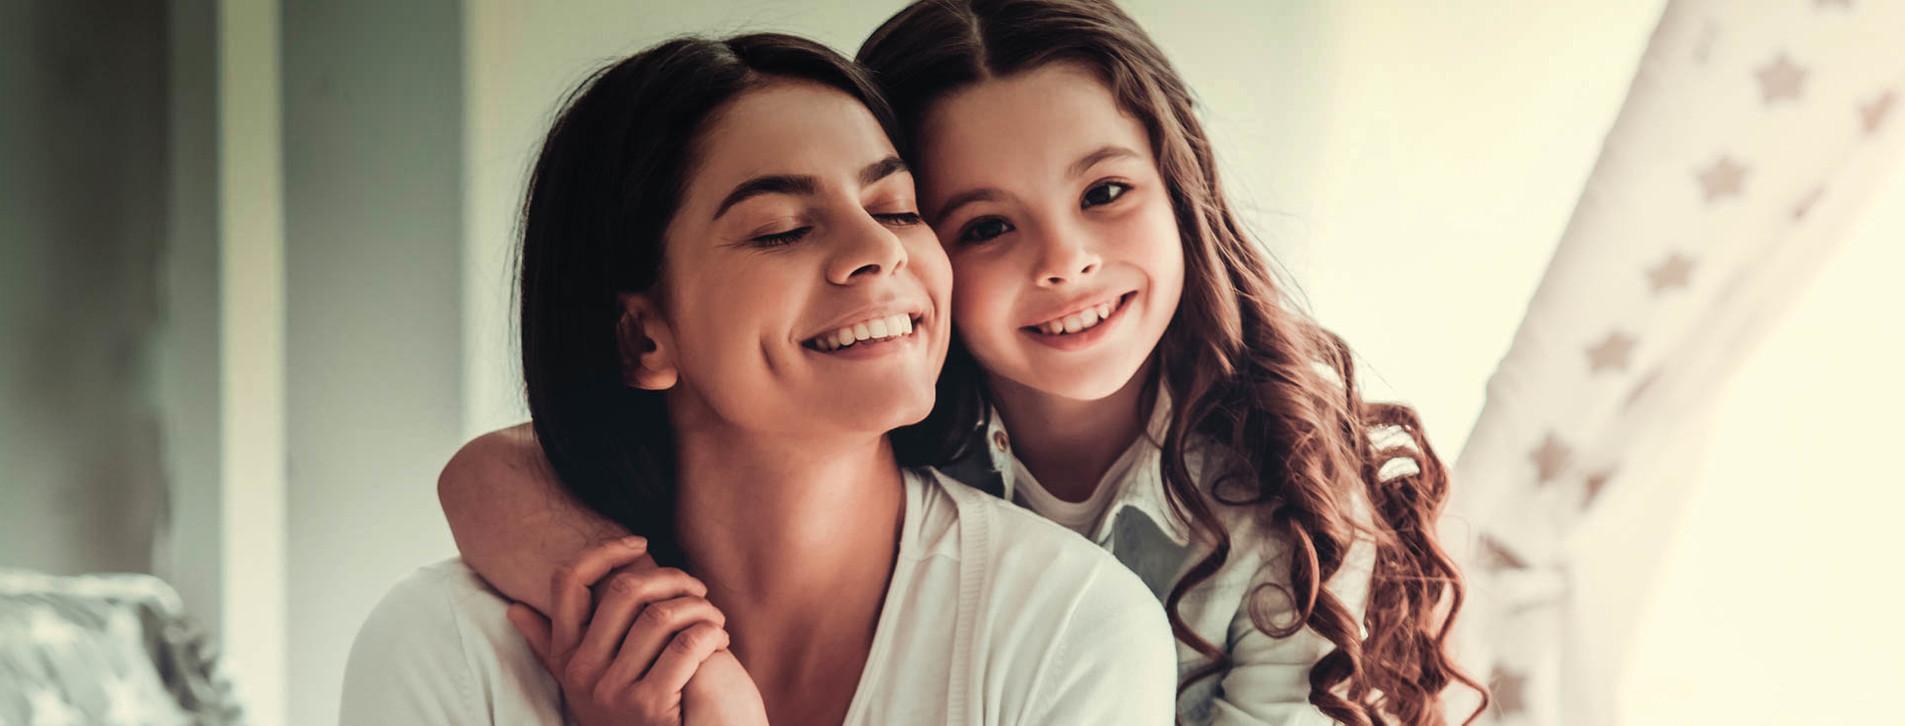 Фото 1 - Beauty Day для мамы и дочки